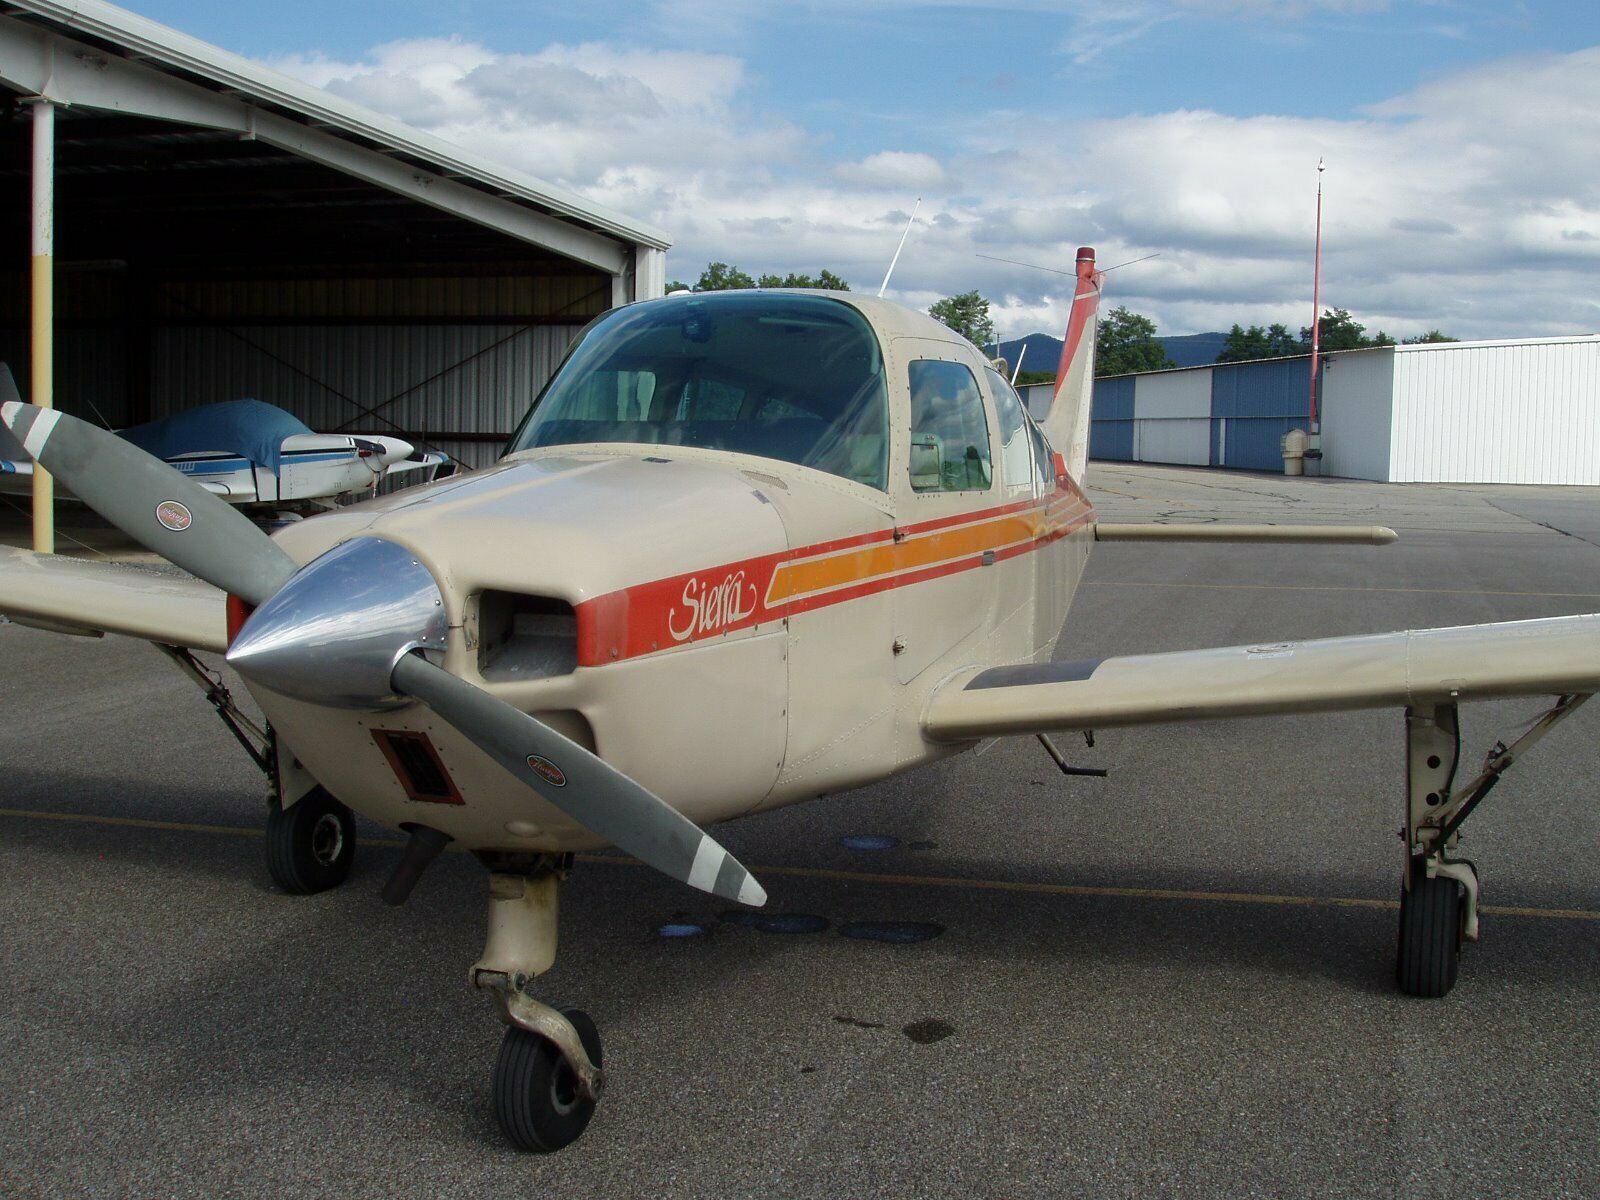 renewed 1979 Beechcraft SIERRA aircraft for sale